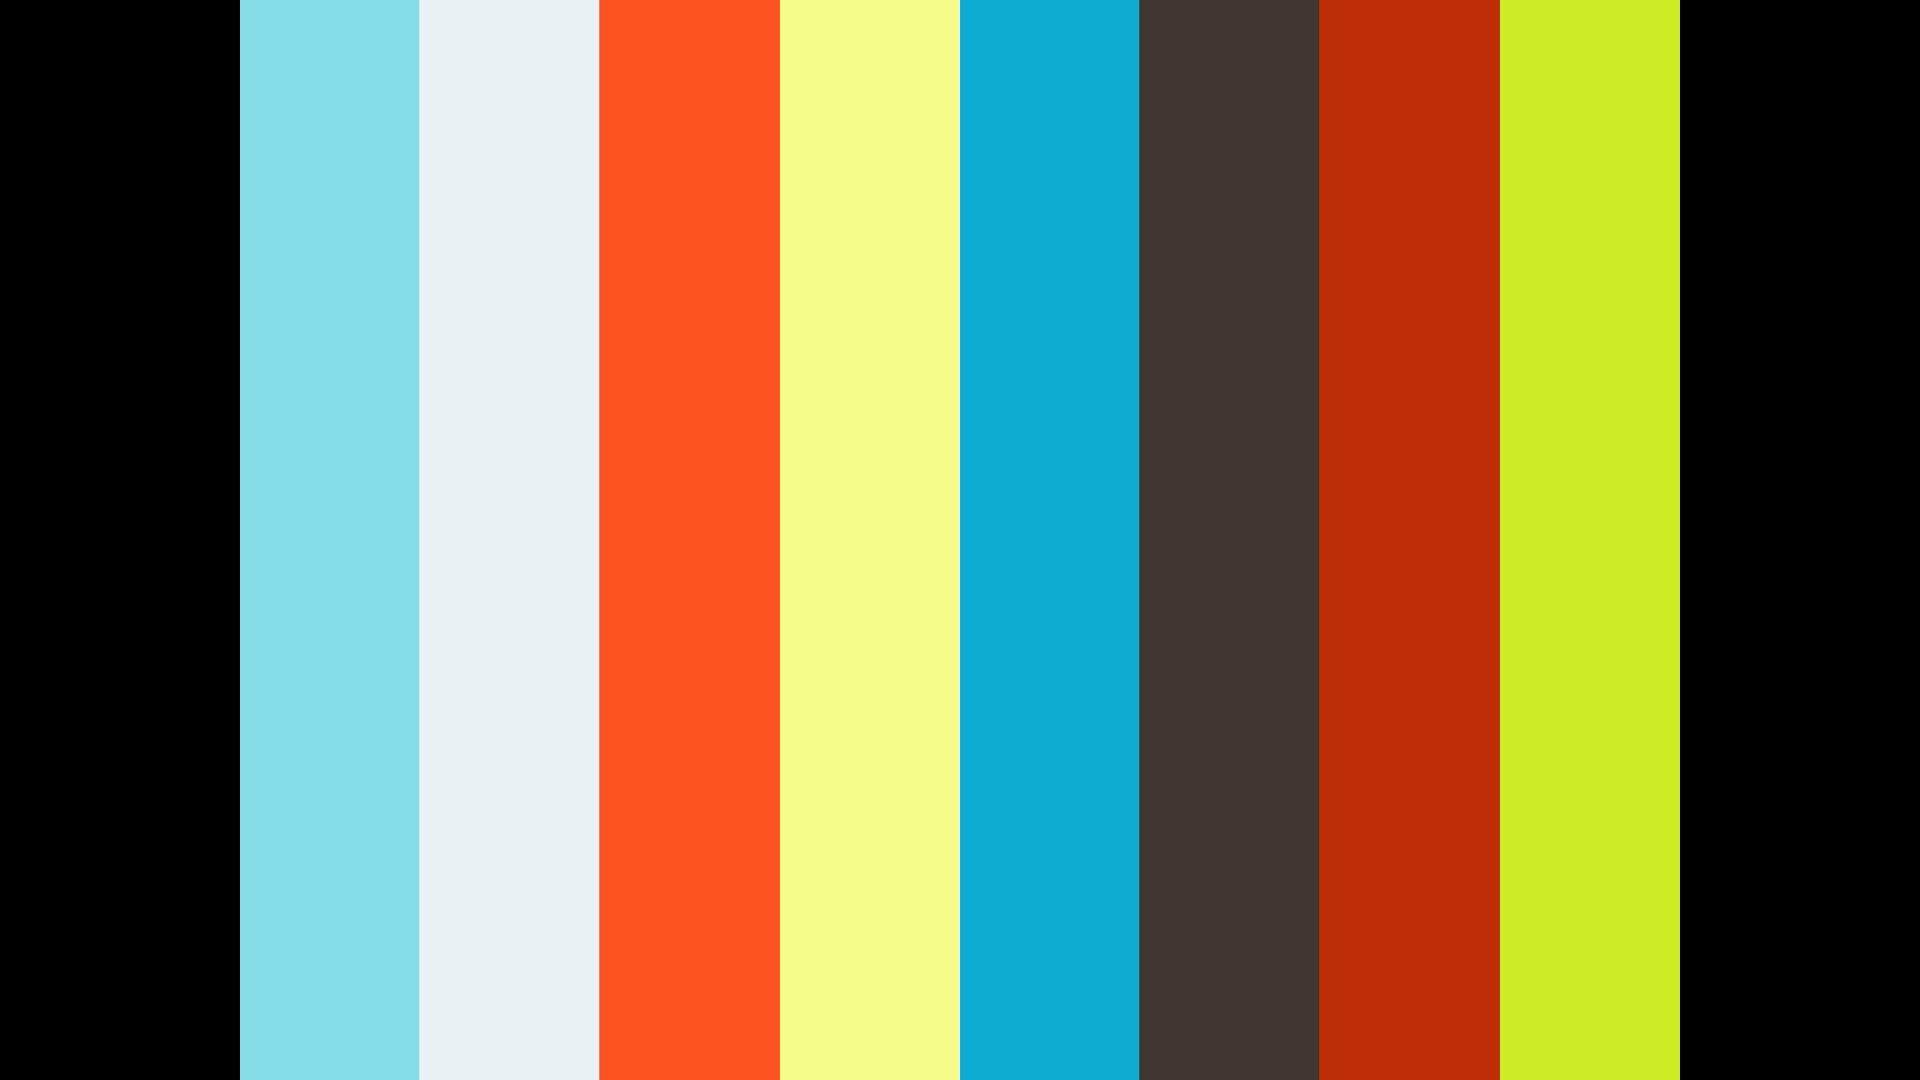 Mixology 2015 Часть 02: HowDoYouSayYamInAfrican?  // Марк Фелл // Uumans